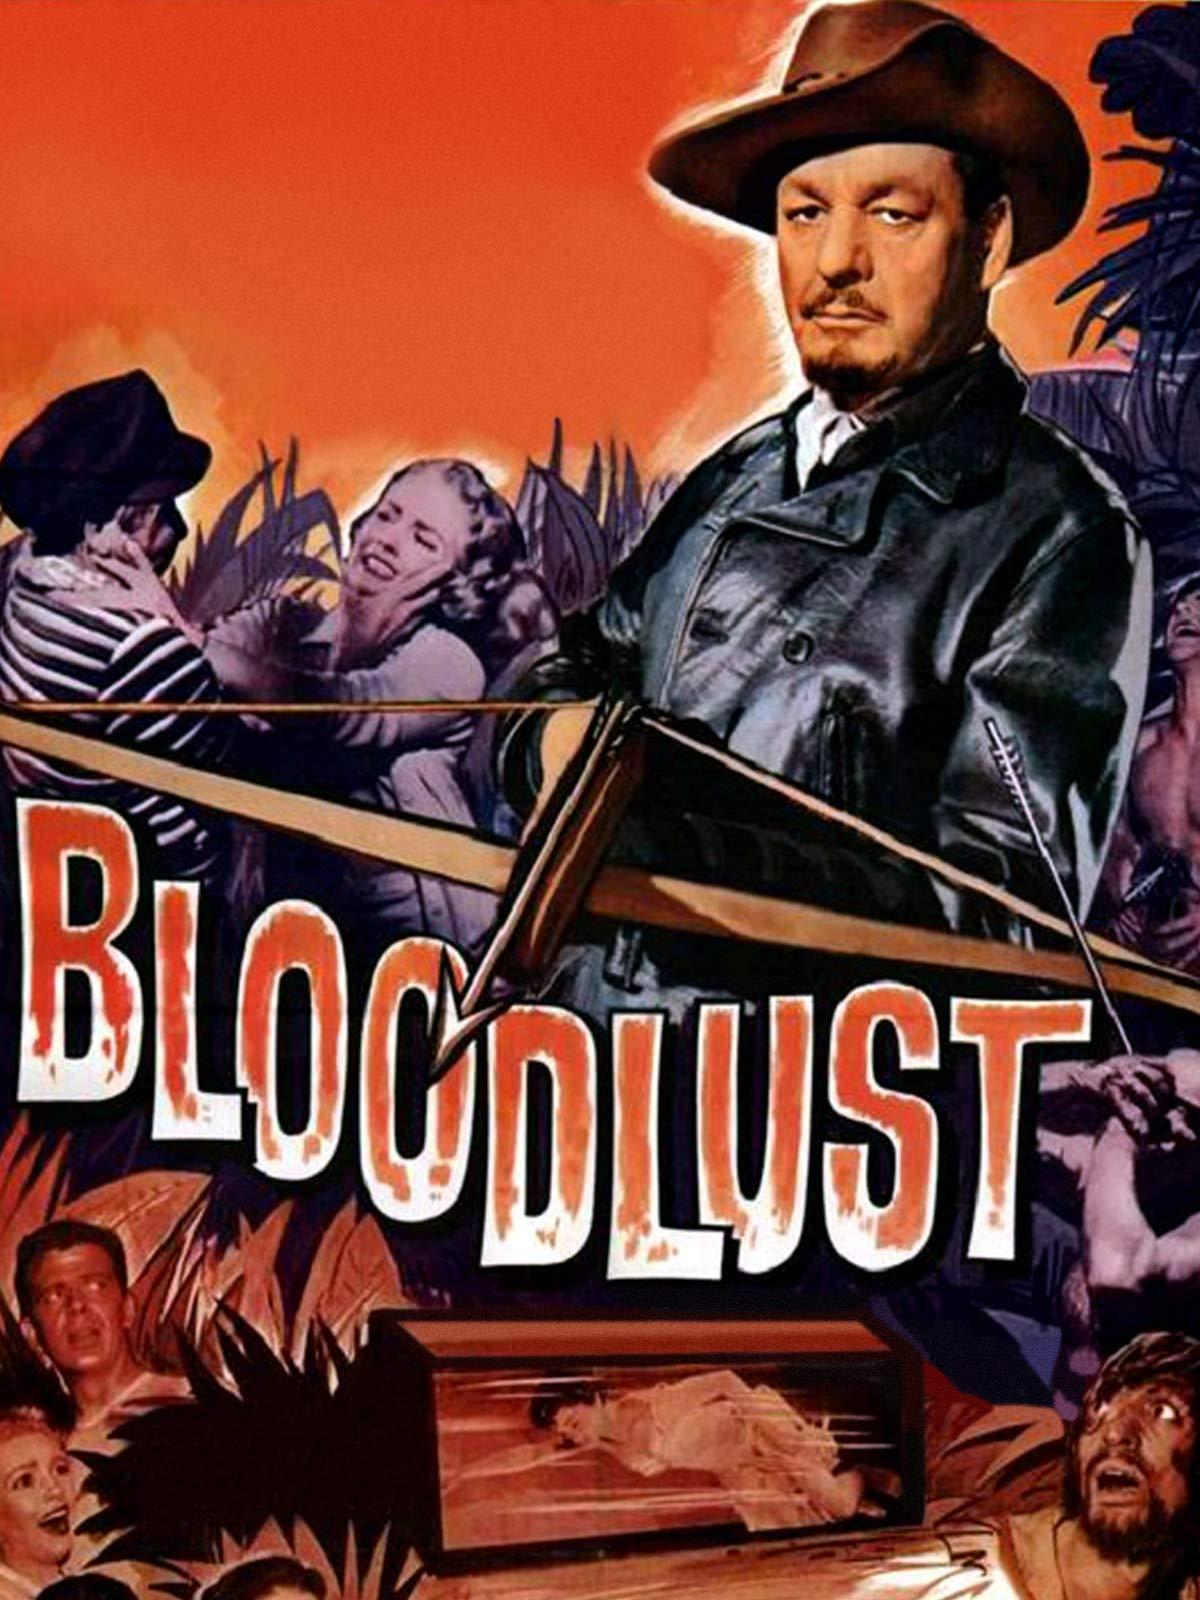 Bloodlust on Amazon Prime Video UK